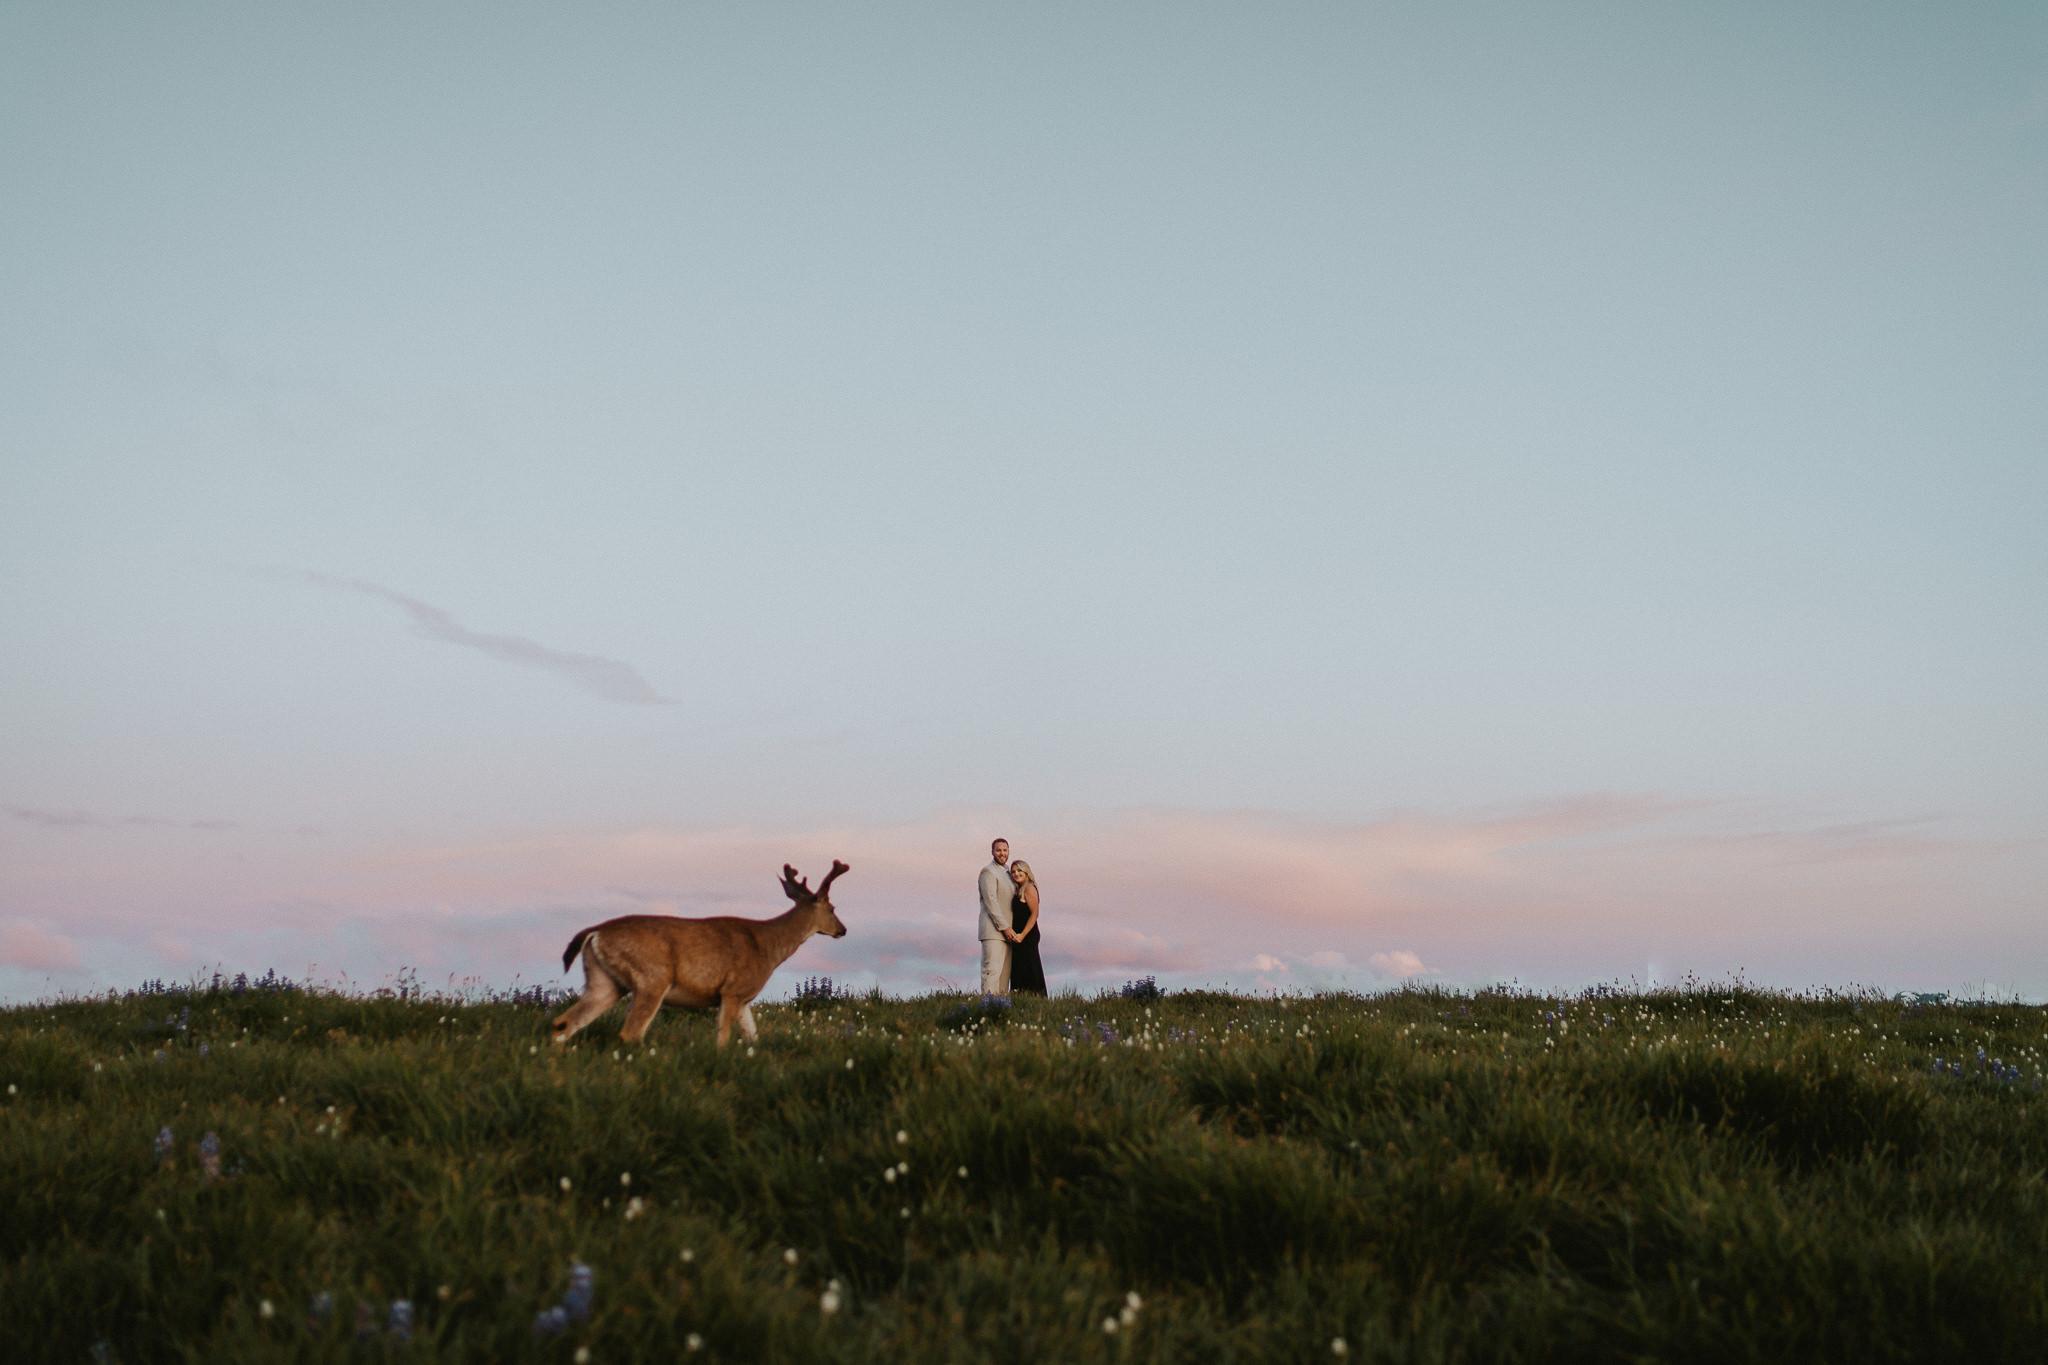 Deer-photobomb-Olympic-National-Park